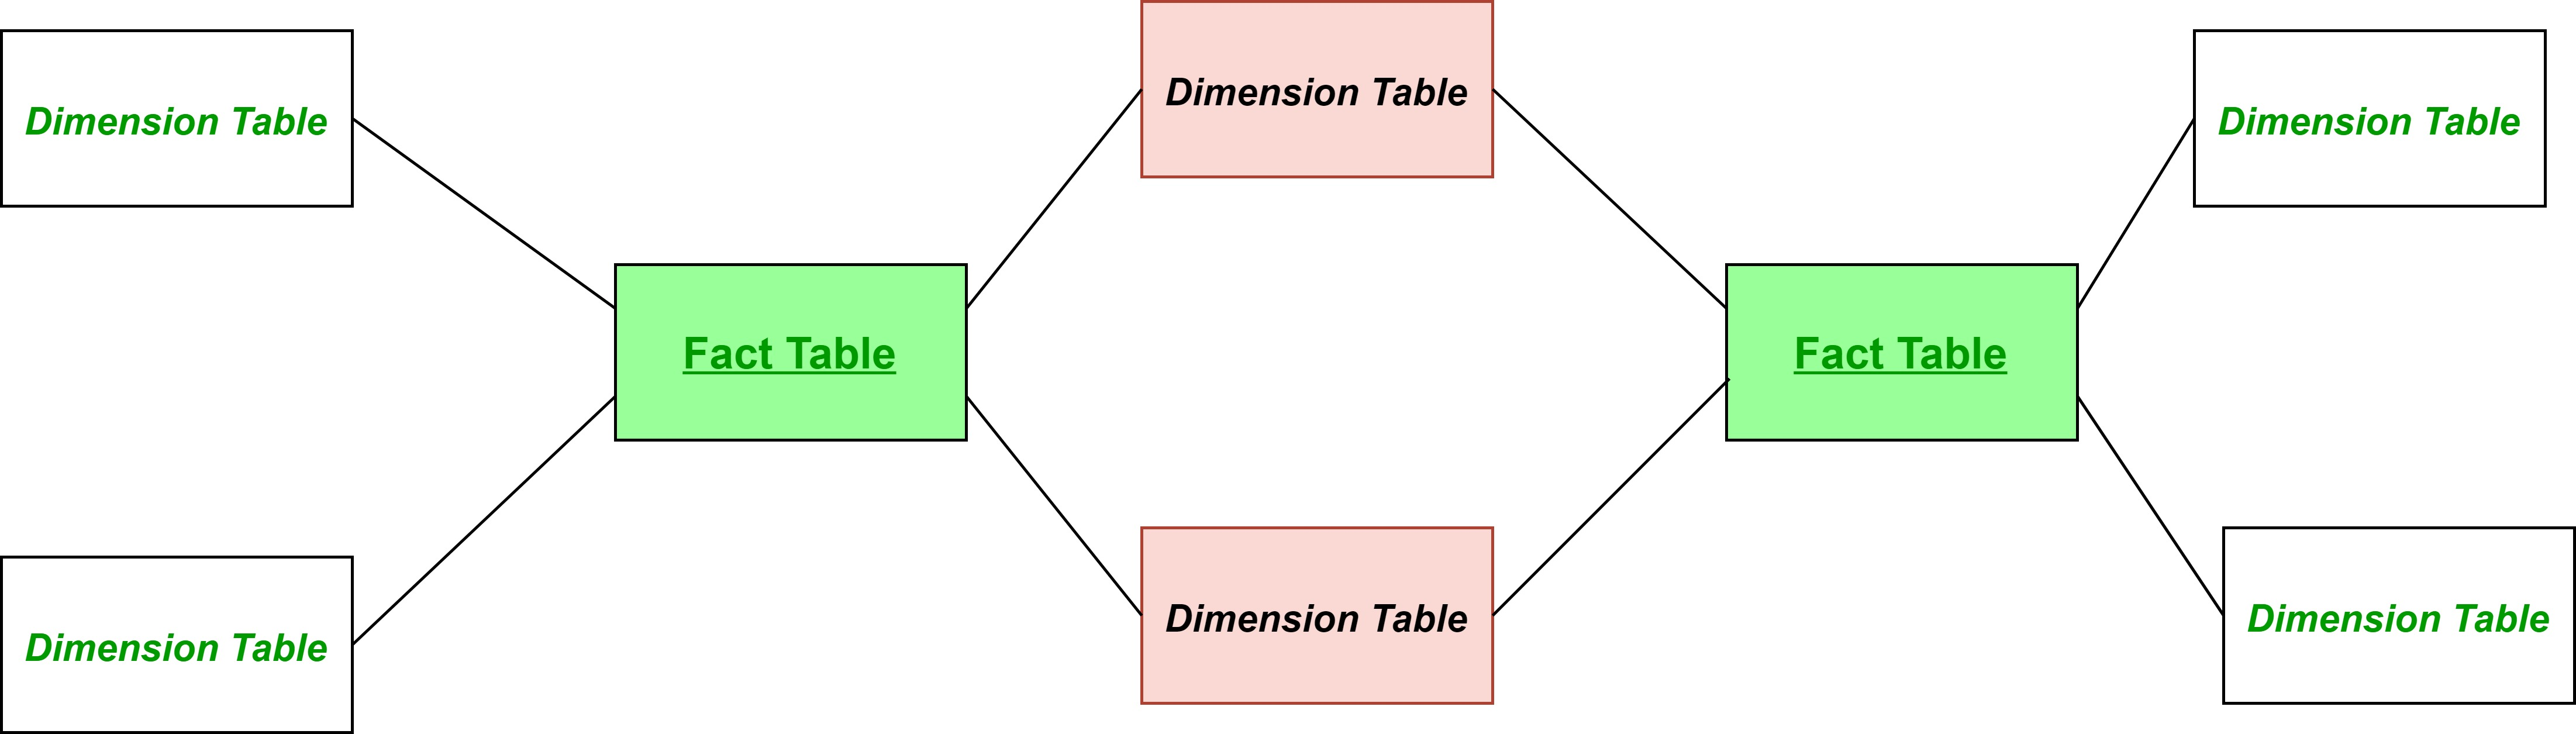 Fact Constellation in Data Warehouse modelling - GeeksforGeeks